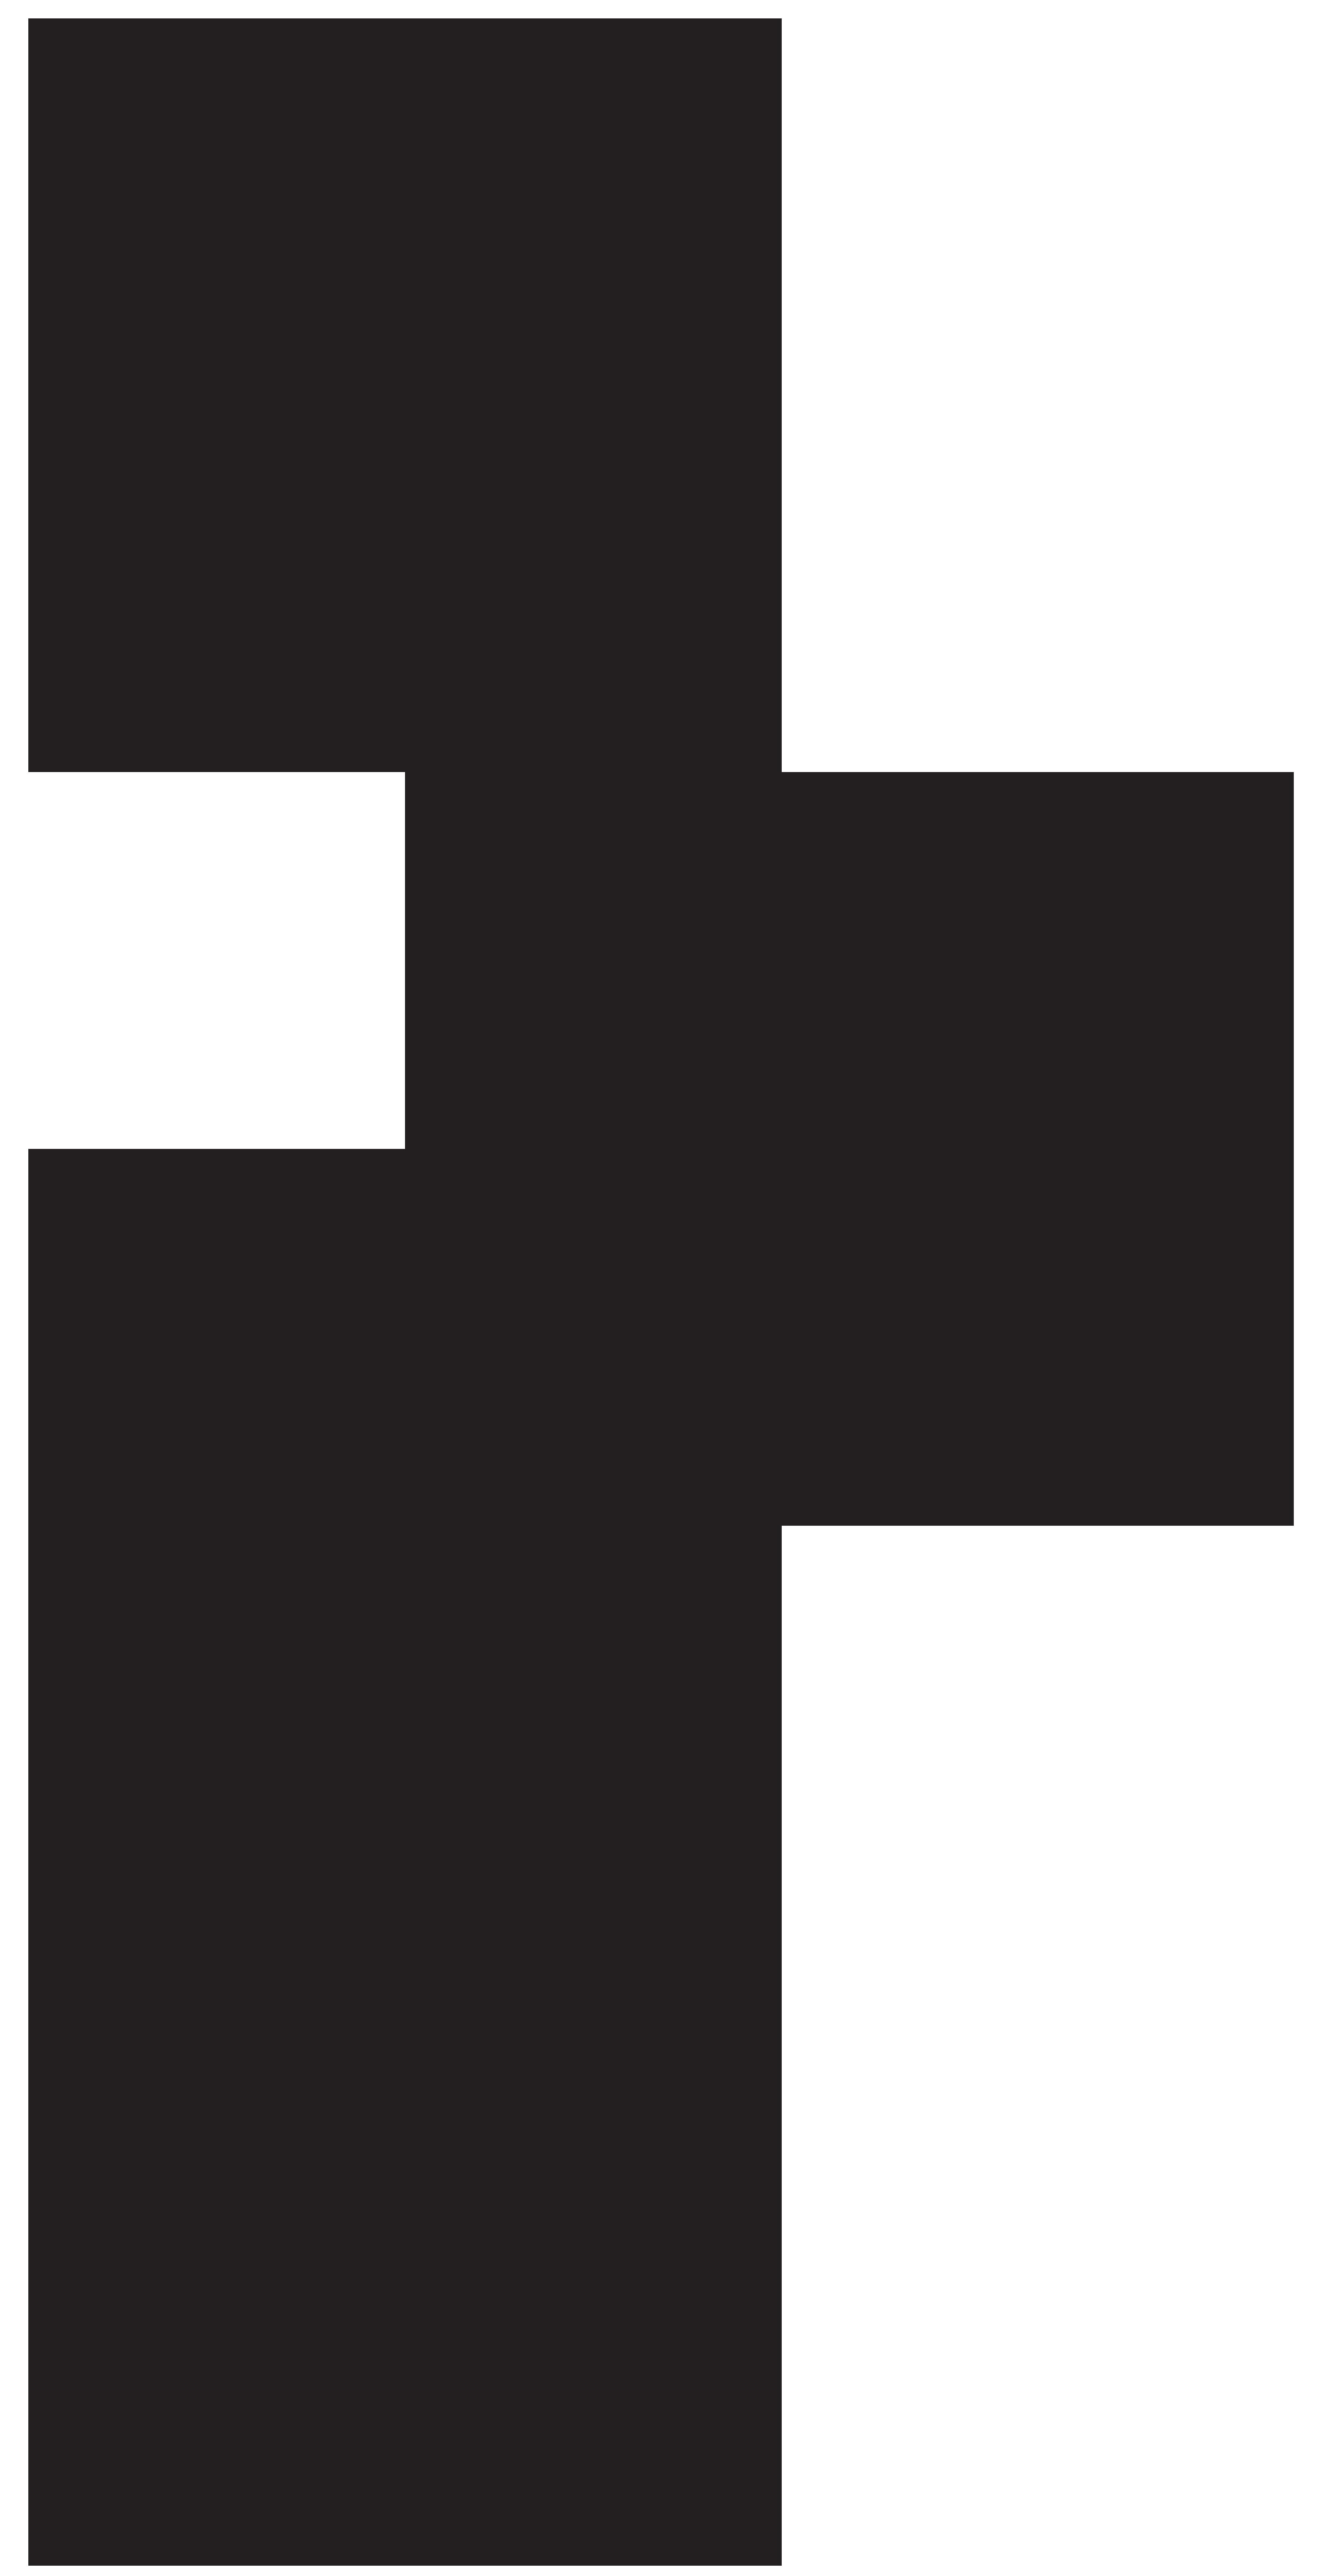 Clipart design rose. Silhouette png clip art